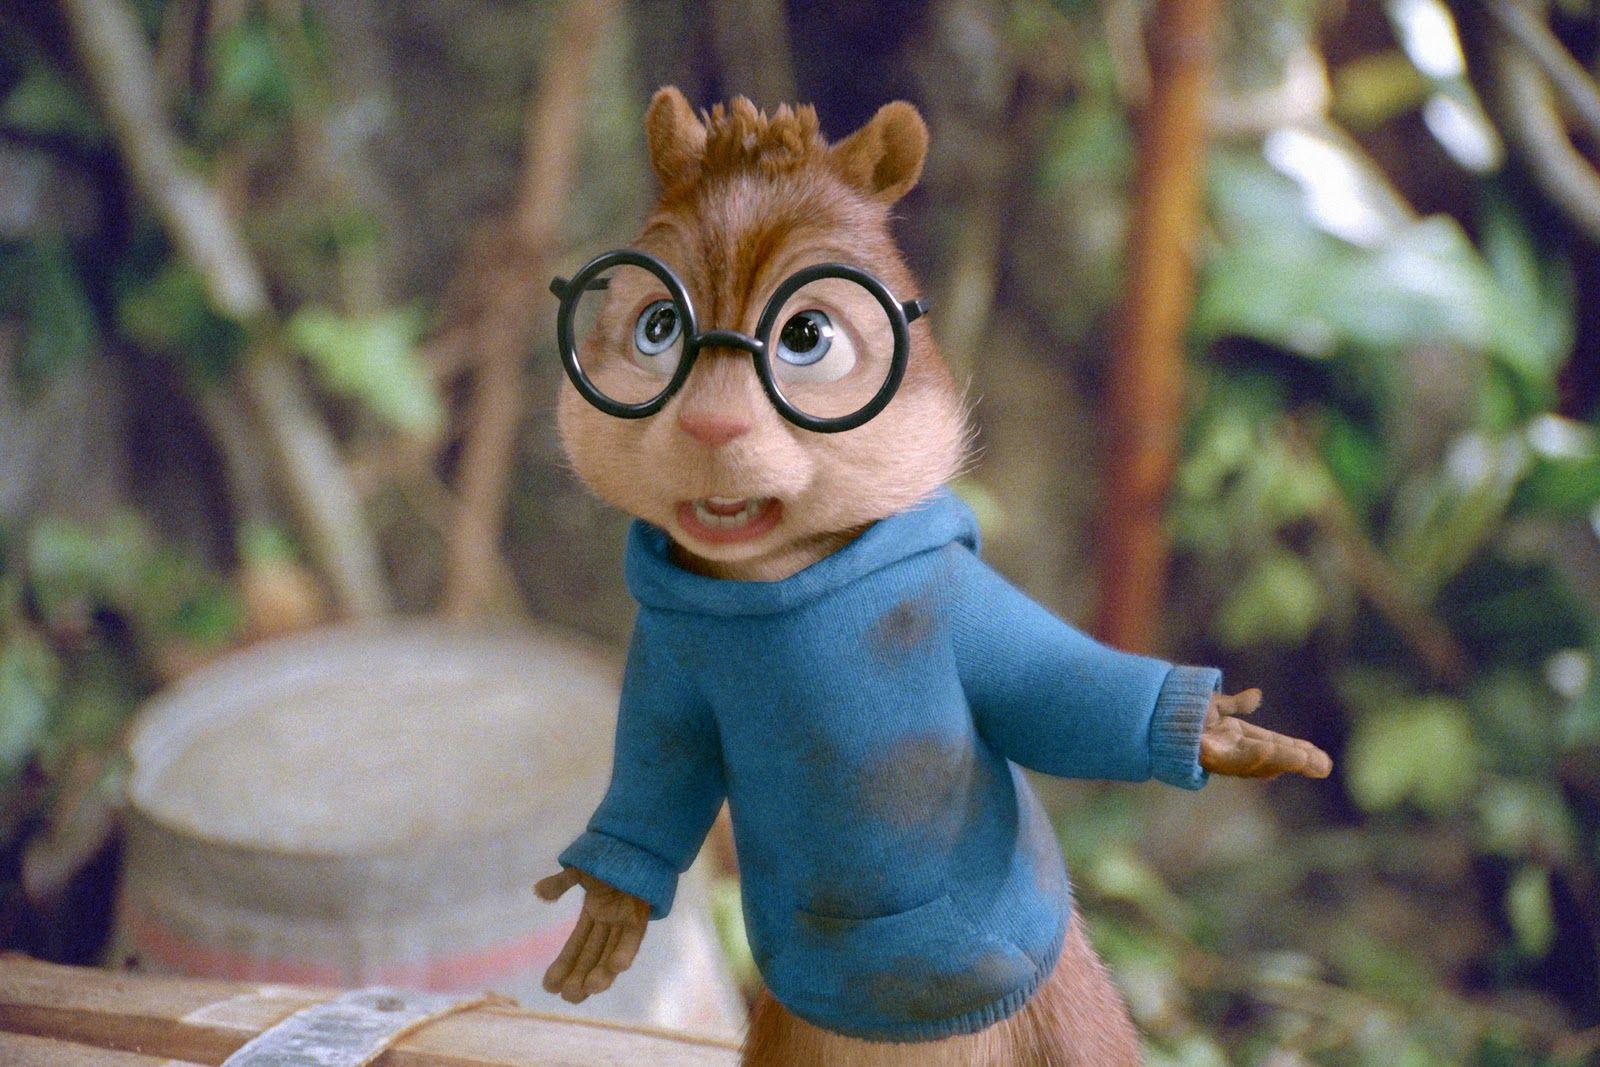 chipmunks chipwrecked | Chipmunks\' Chipwrecked on a character ...